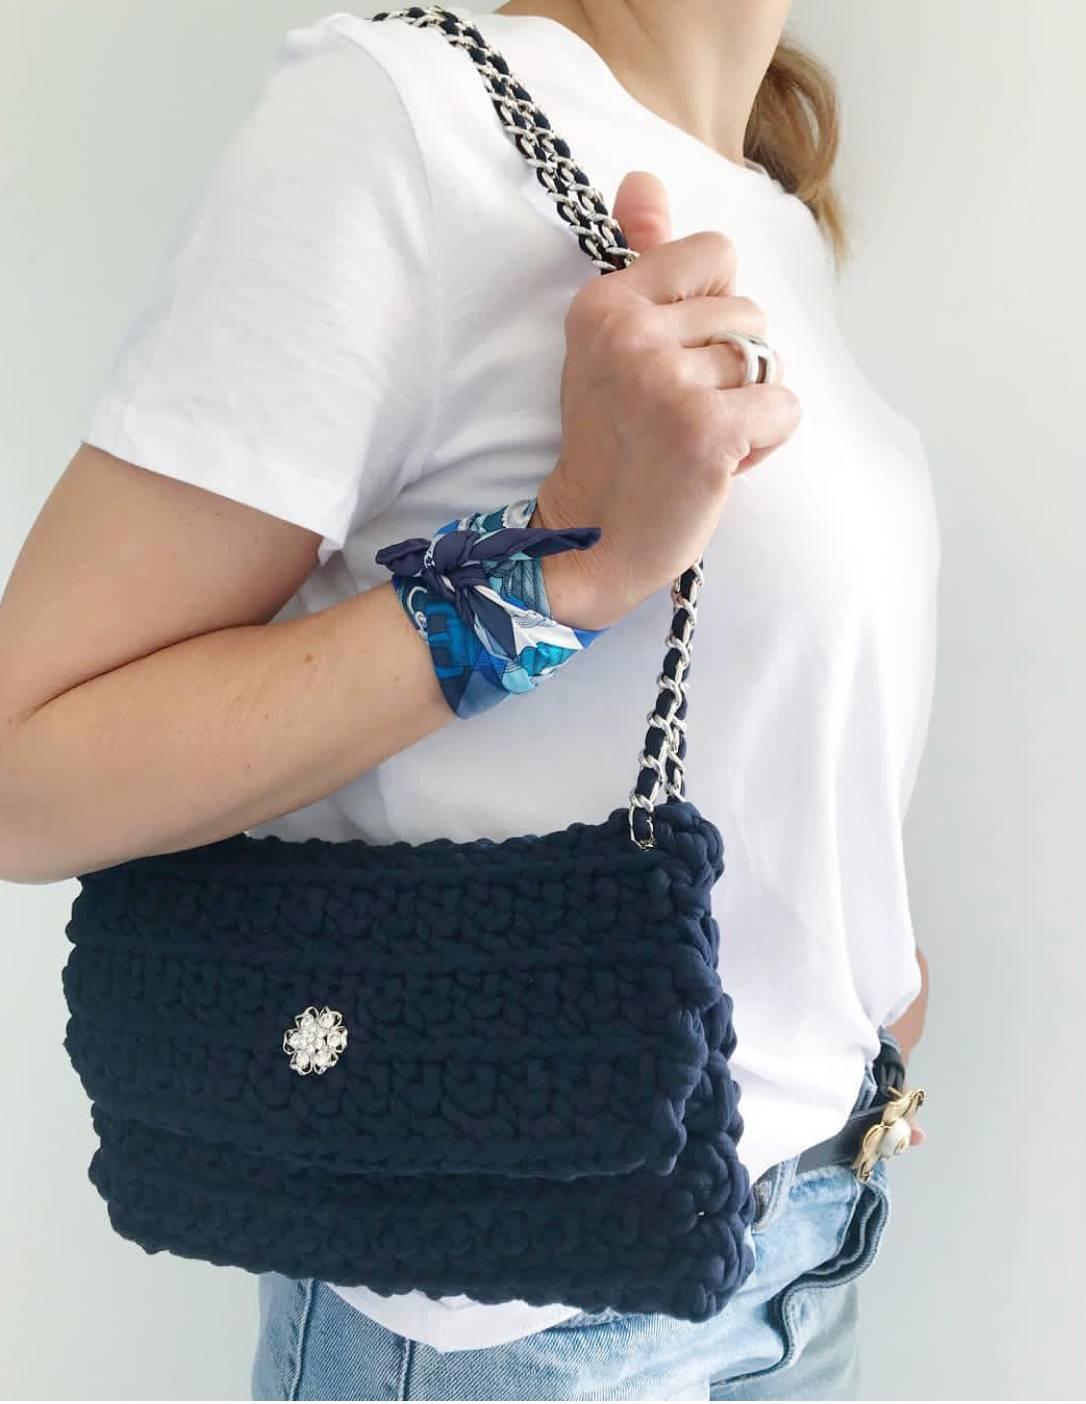 isance Shop les chachas handmade de Chloé en trapilho